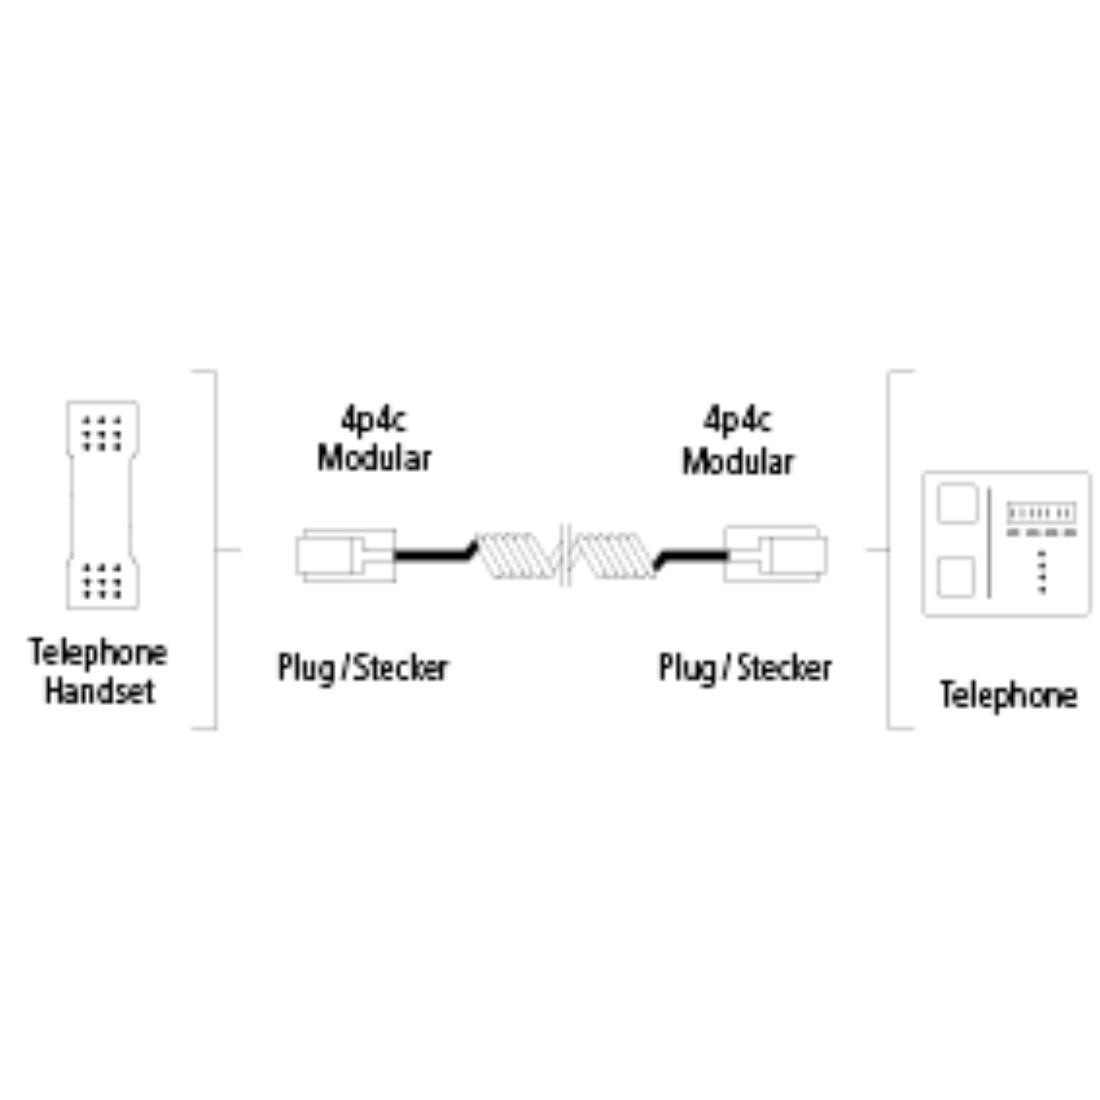 00044864 Hama Handset Cord 4p4c Modular Plug 3 Connector Wiring Diagram Stx High Res Line Drawing